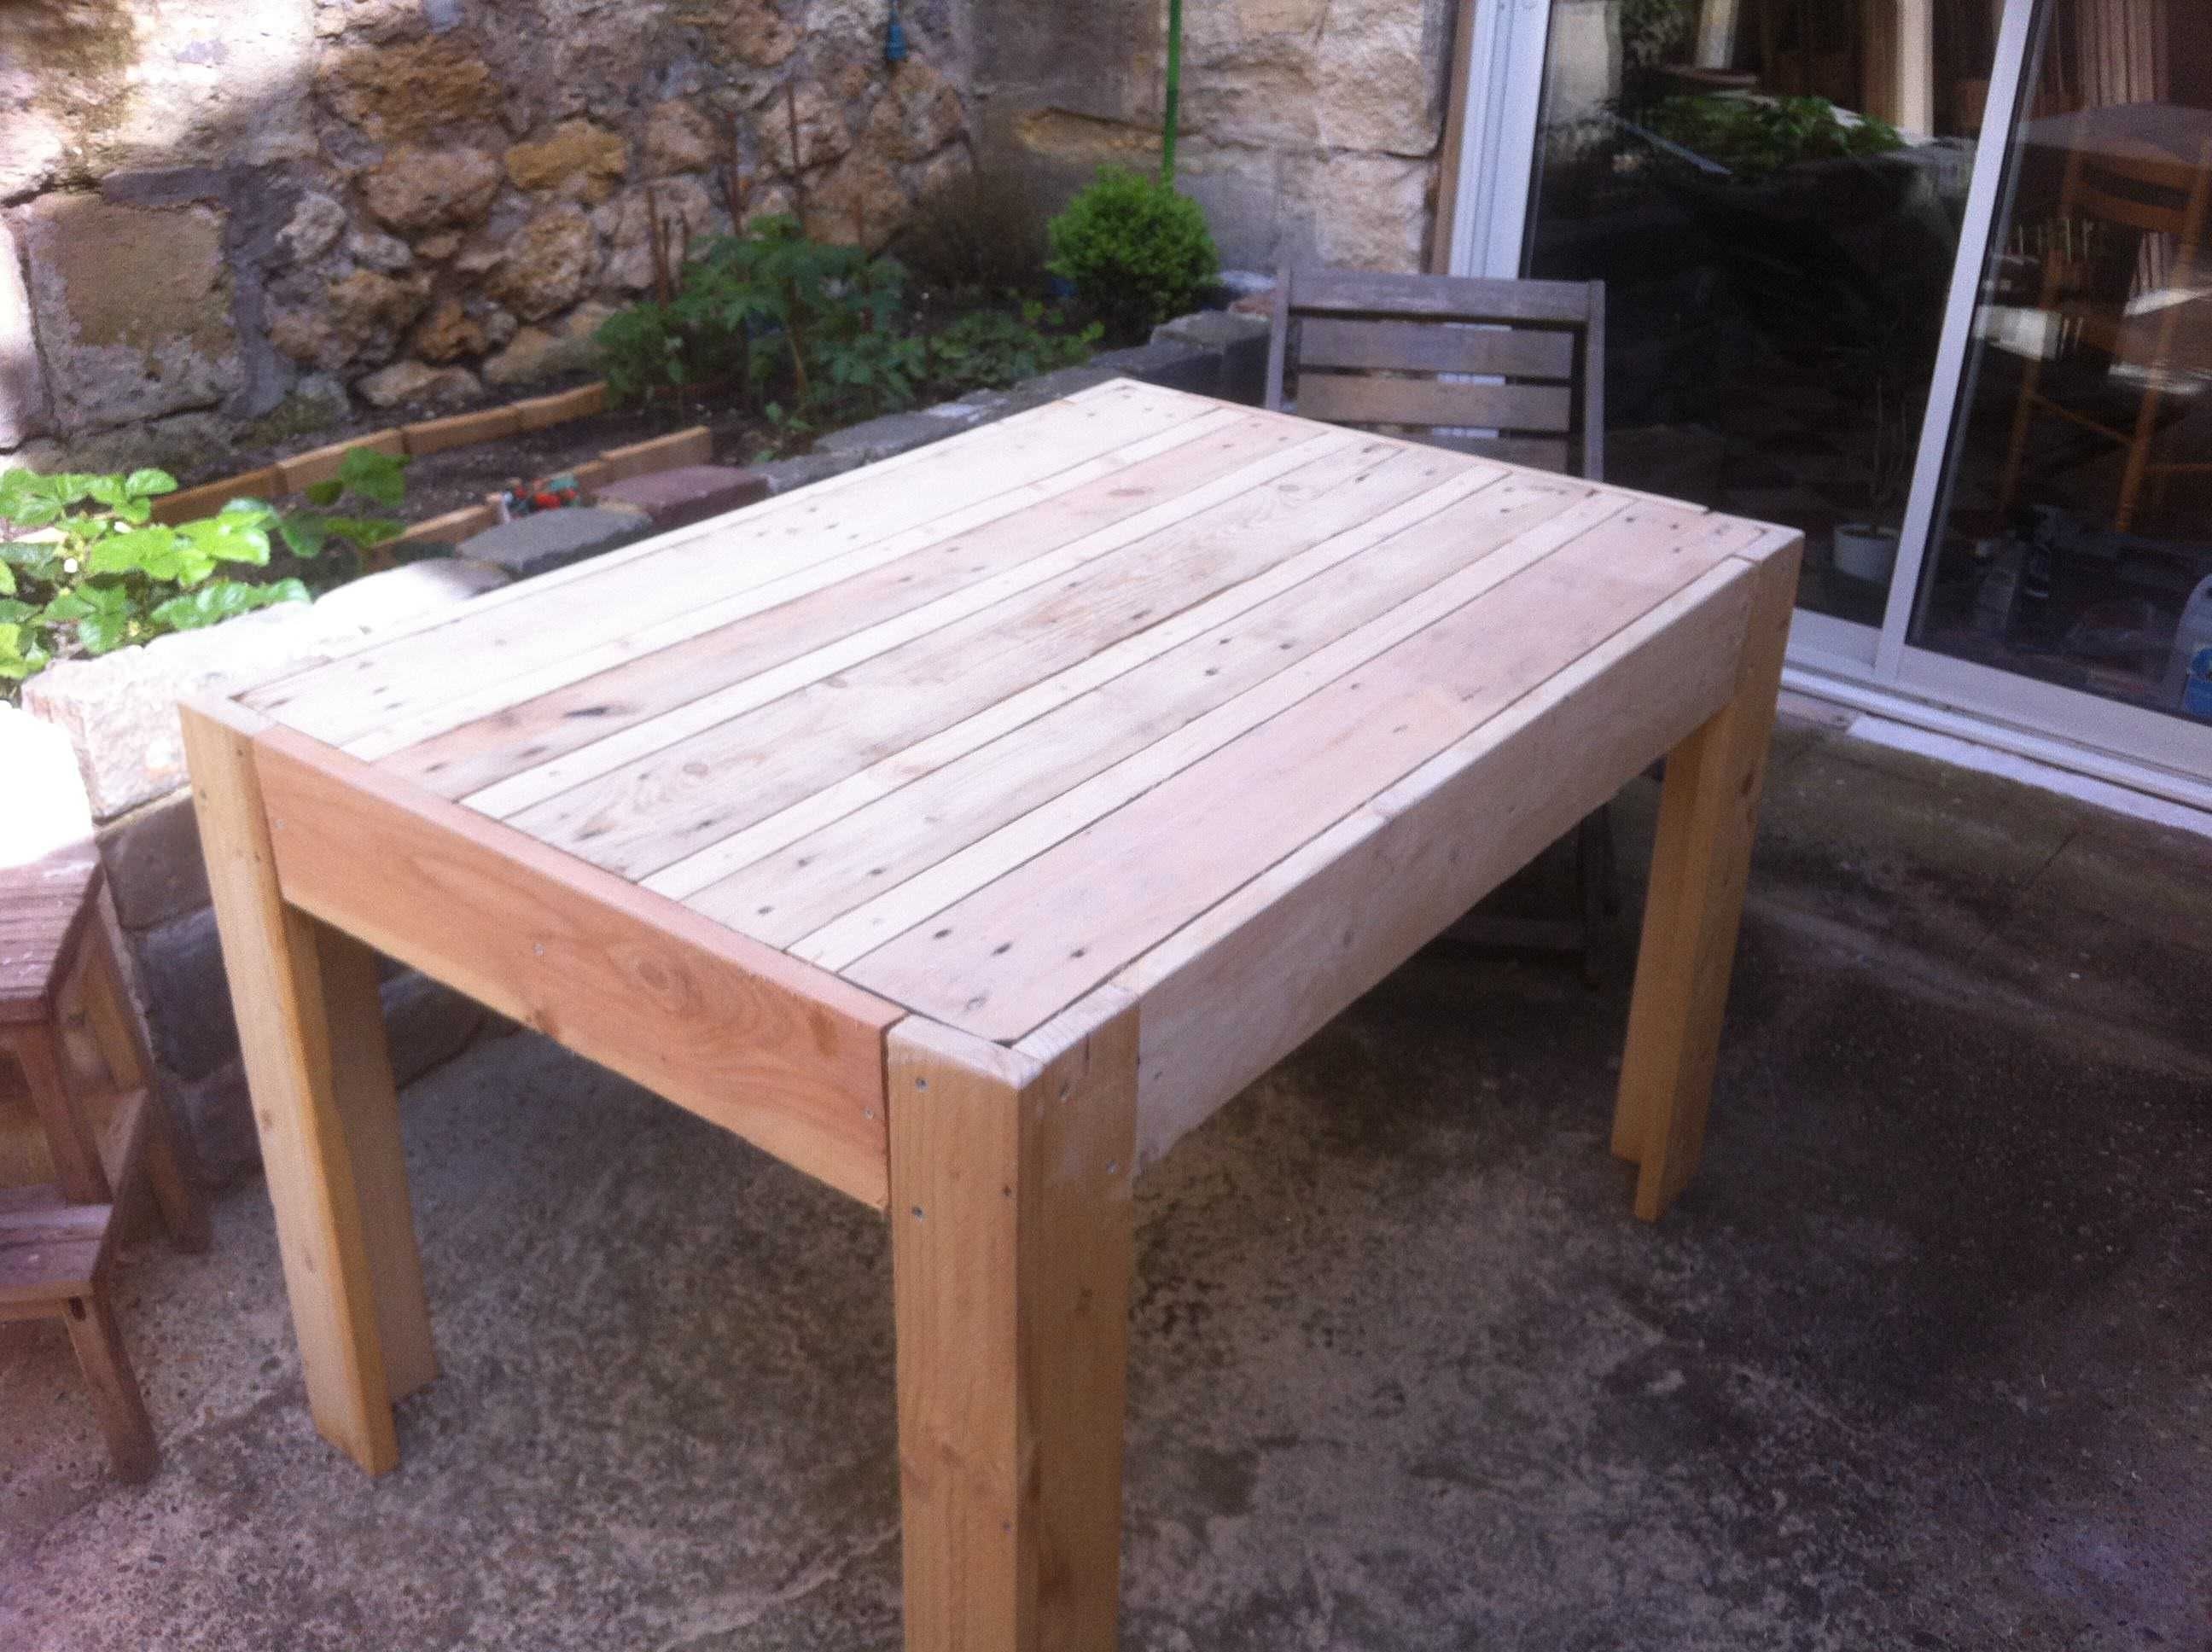 Just A Simple Pallet Table 1001 Pallets Pallet Table Pallet Diy Home Furniture